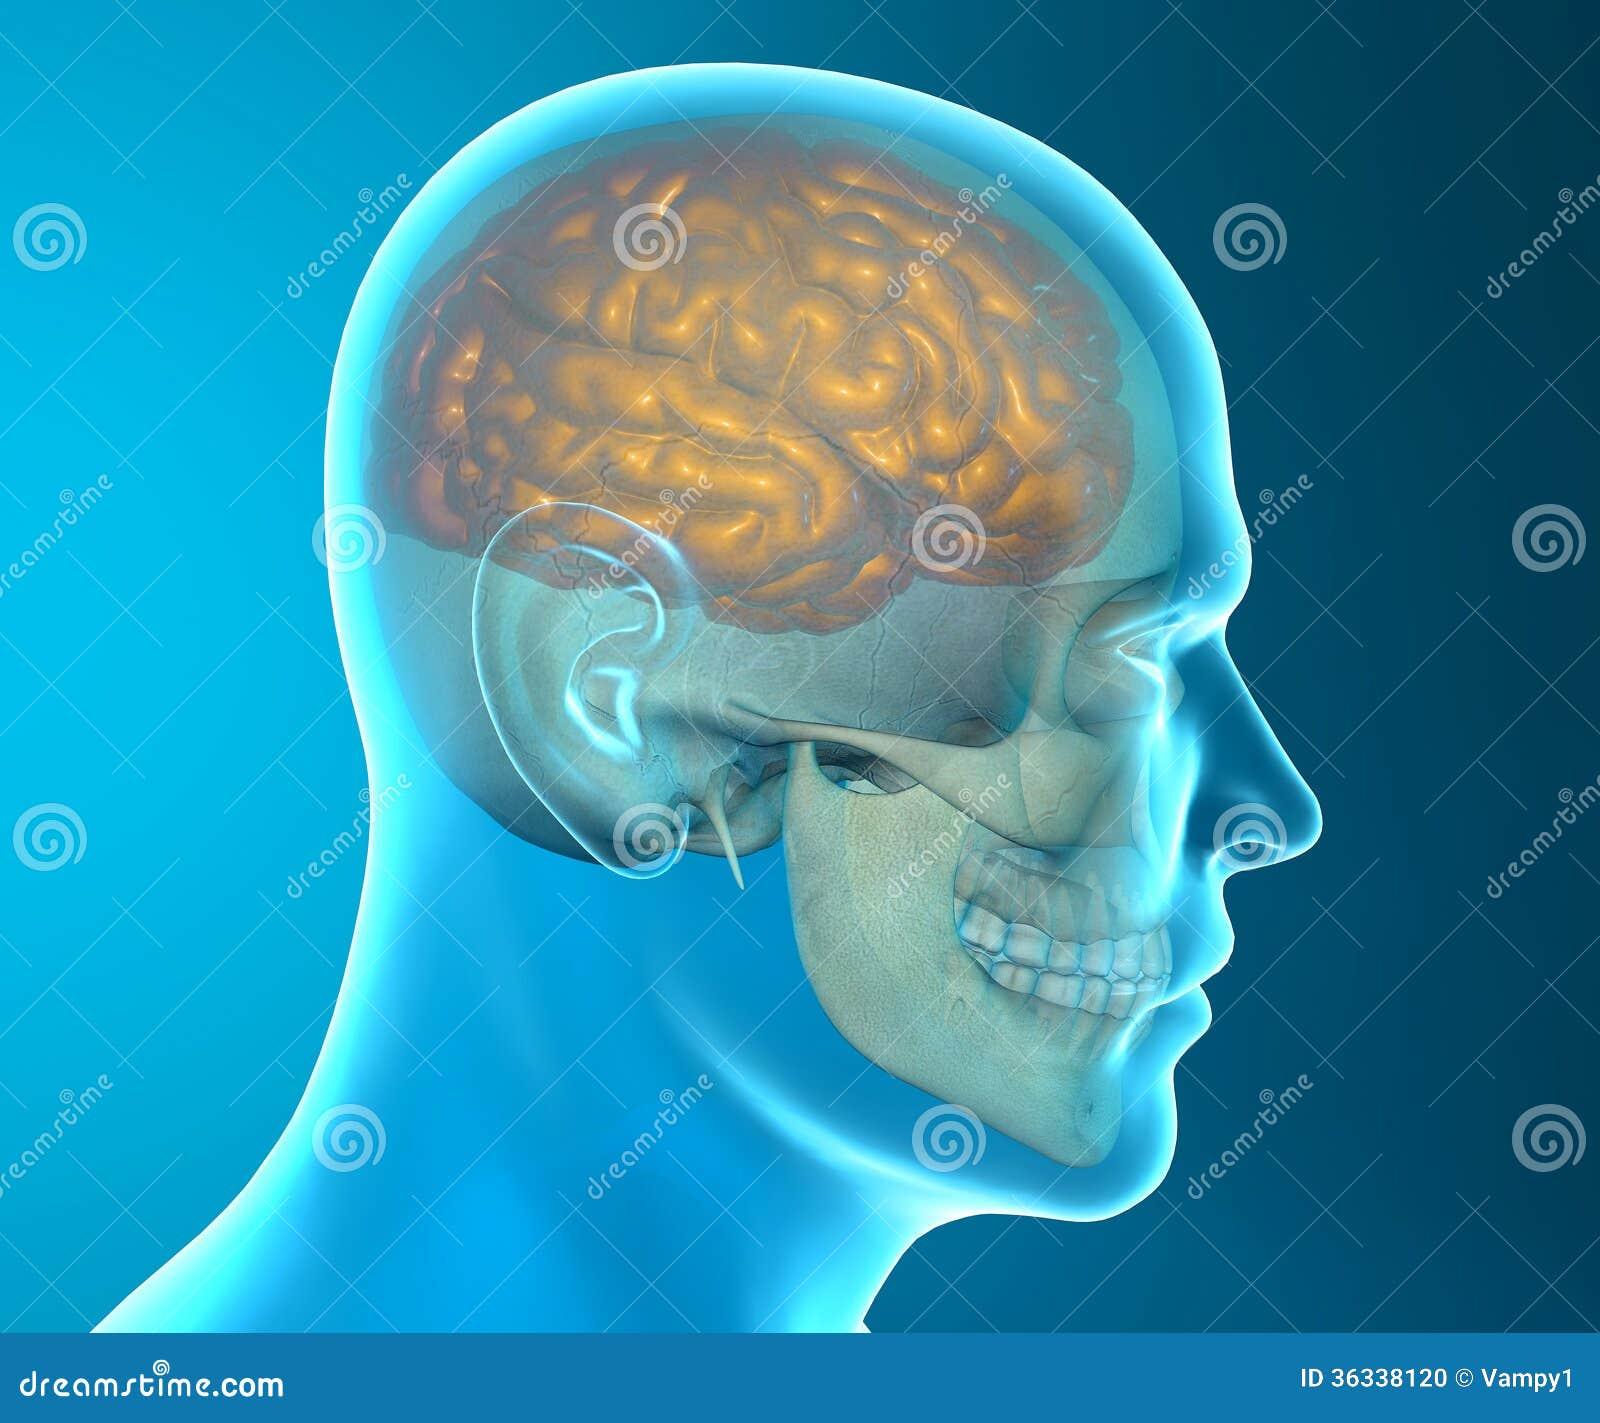 Brain Skull X-ray Head Anatomy Stock Illustration - Illustration of ...